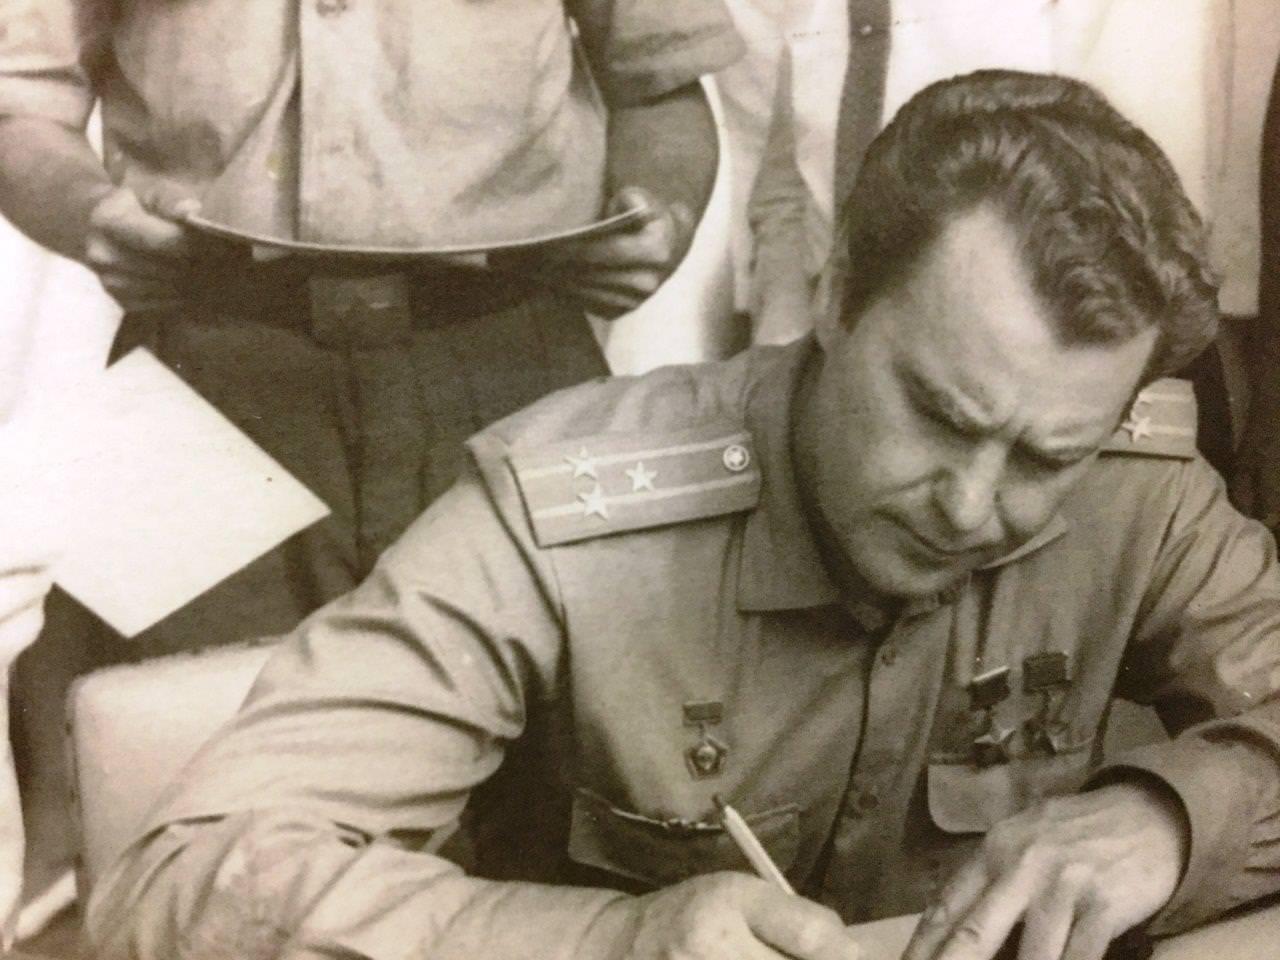 1970. Космонавт Владимир Александрович Шаталов